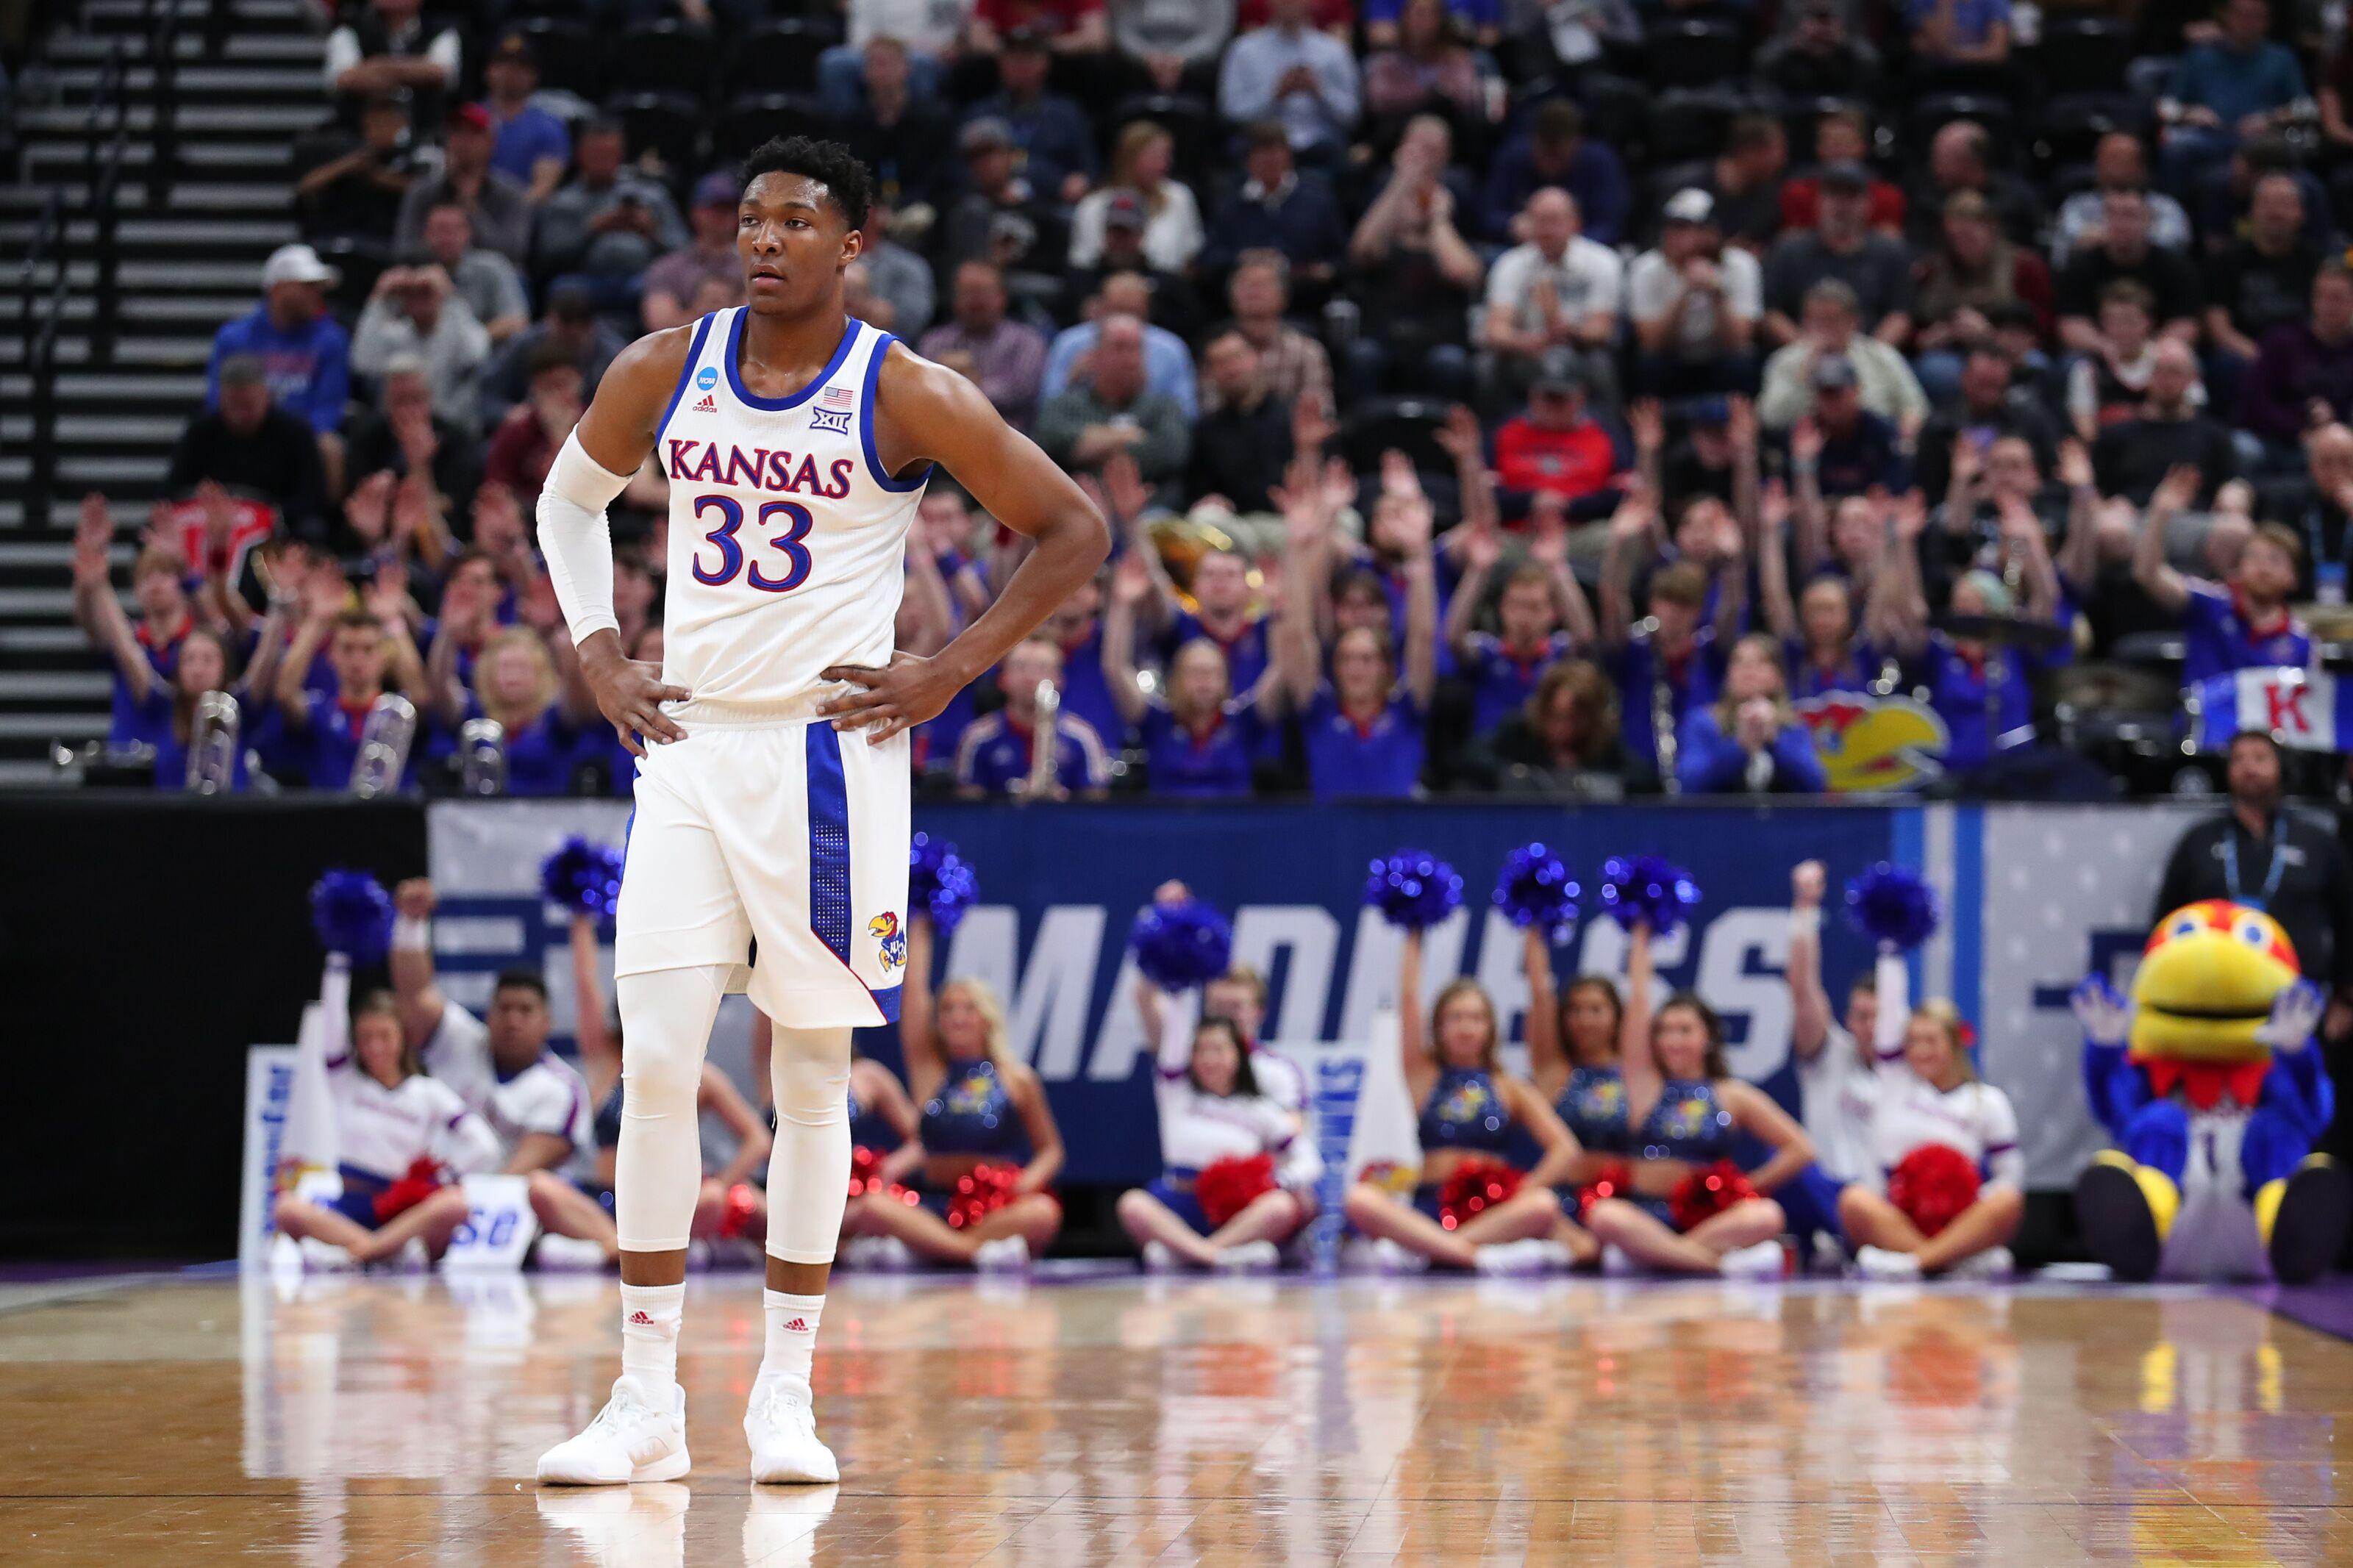 Kansas basketball's David McCormack continues to impress